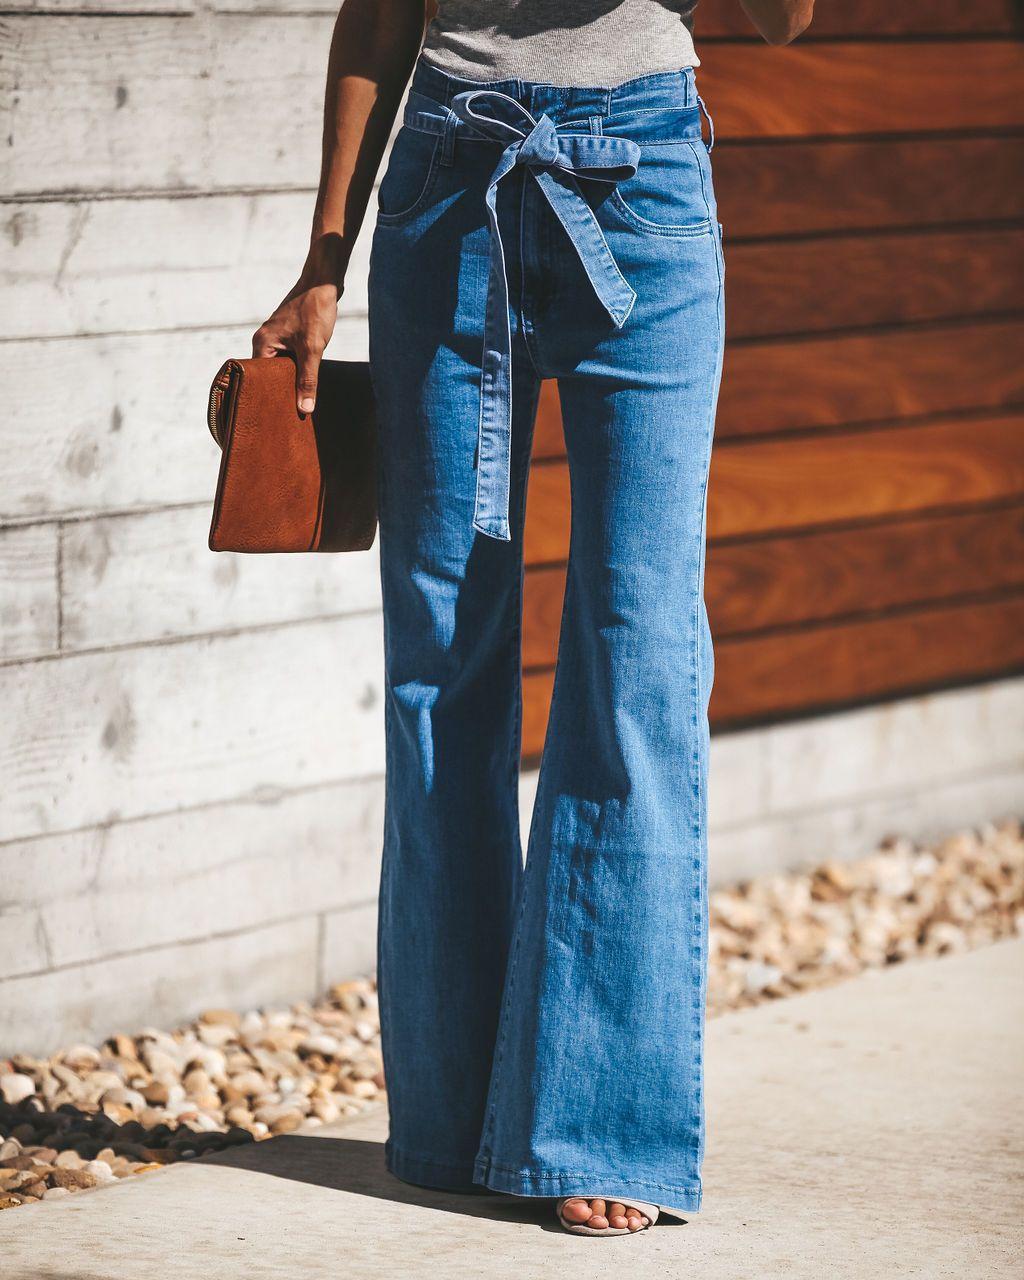 High Waist Slim Drawstring Jeans Women Winter Fashion High Street Vintage Flare Pants Mujer Sky Blue Sashes Denim Femme 2019